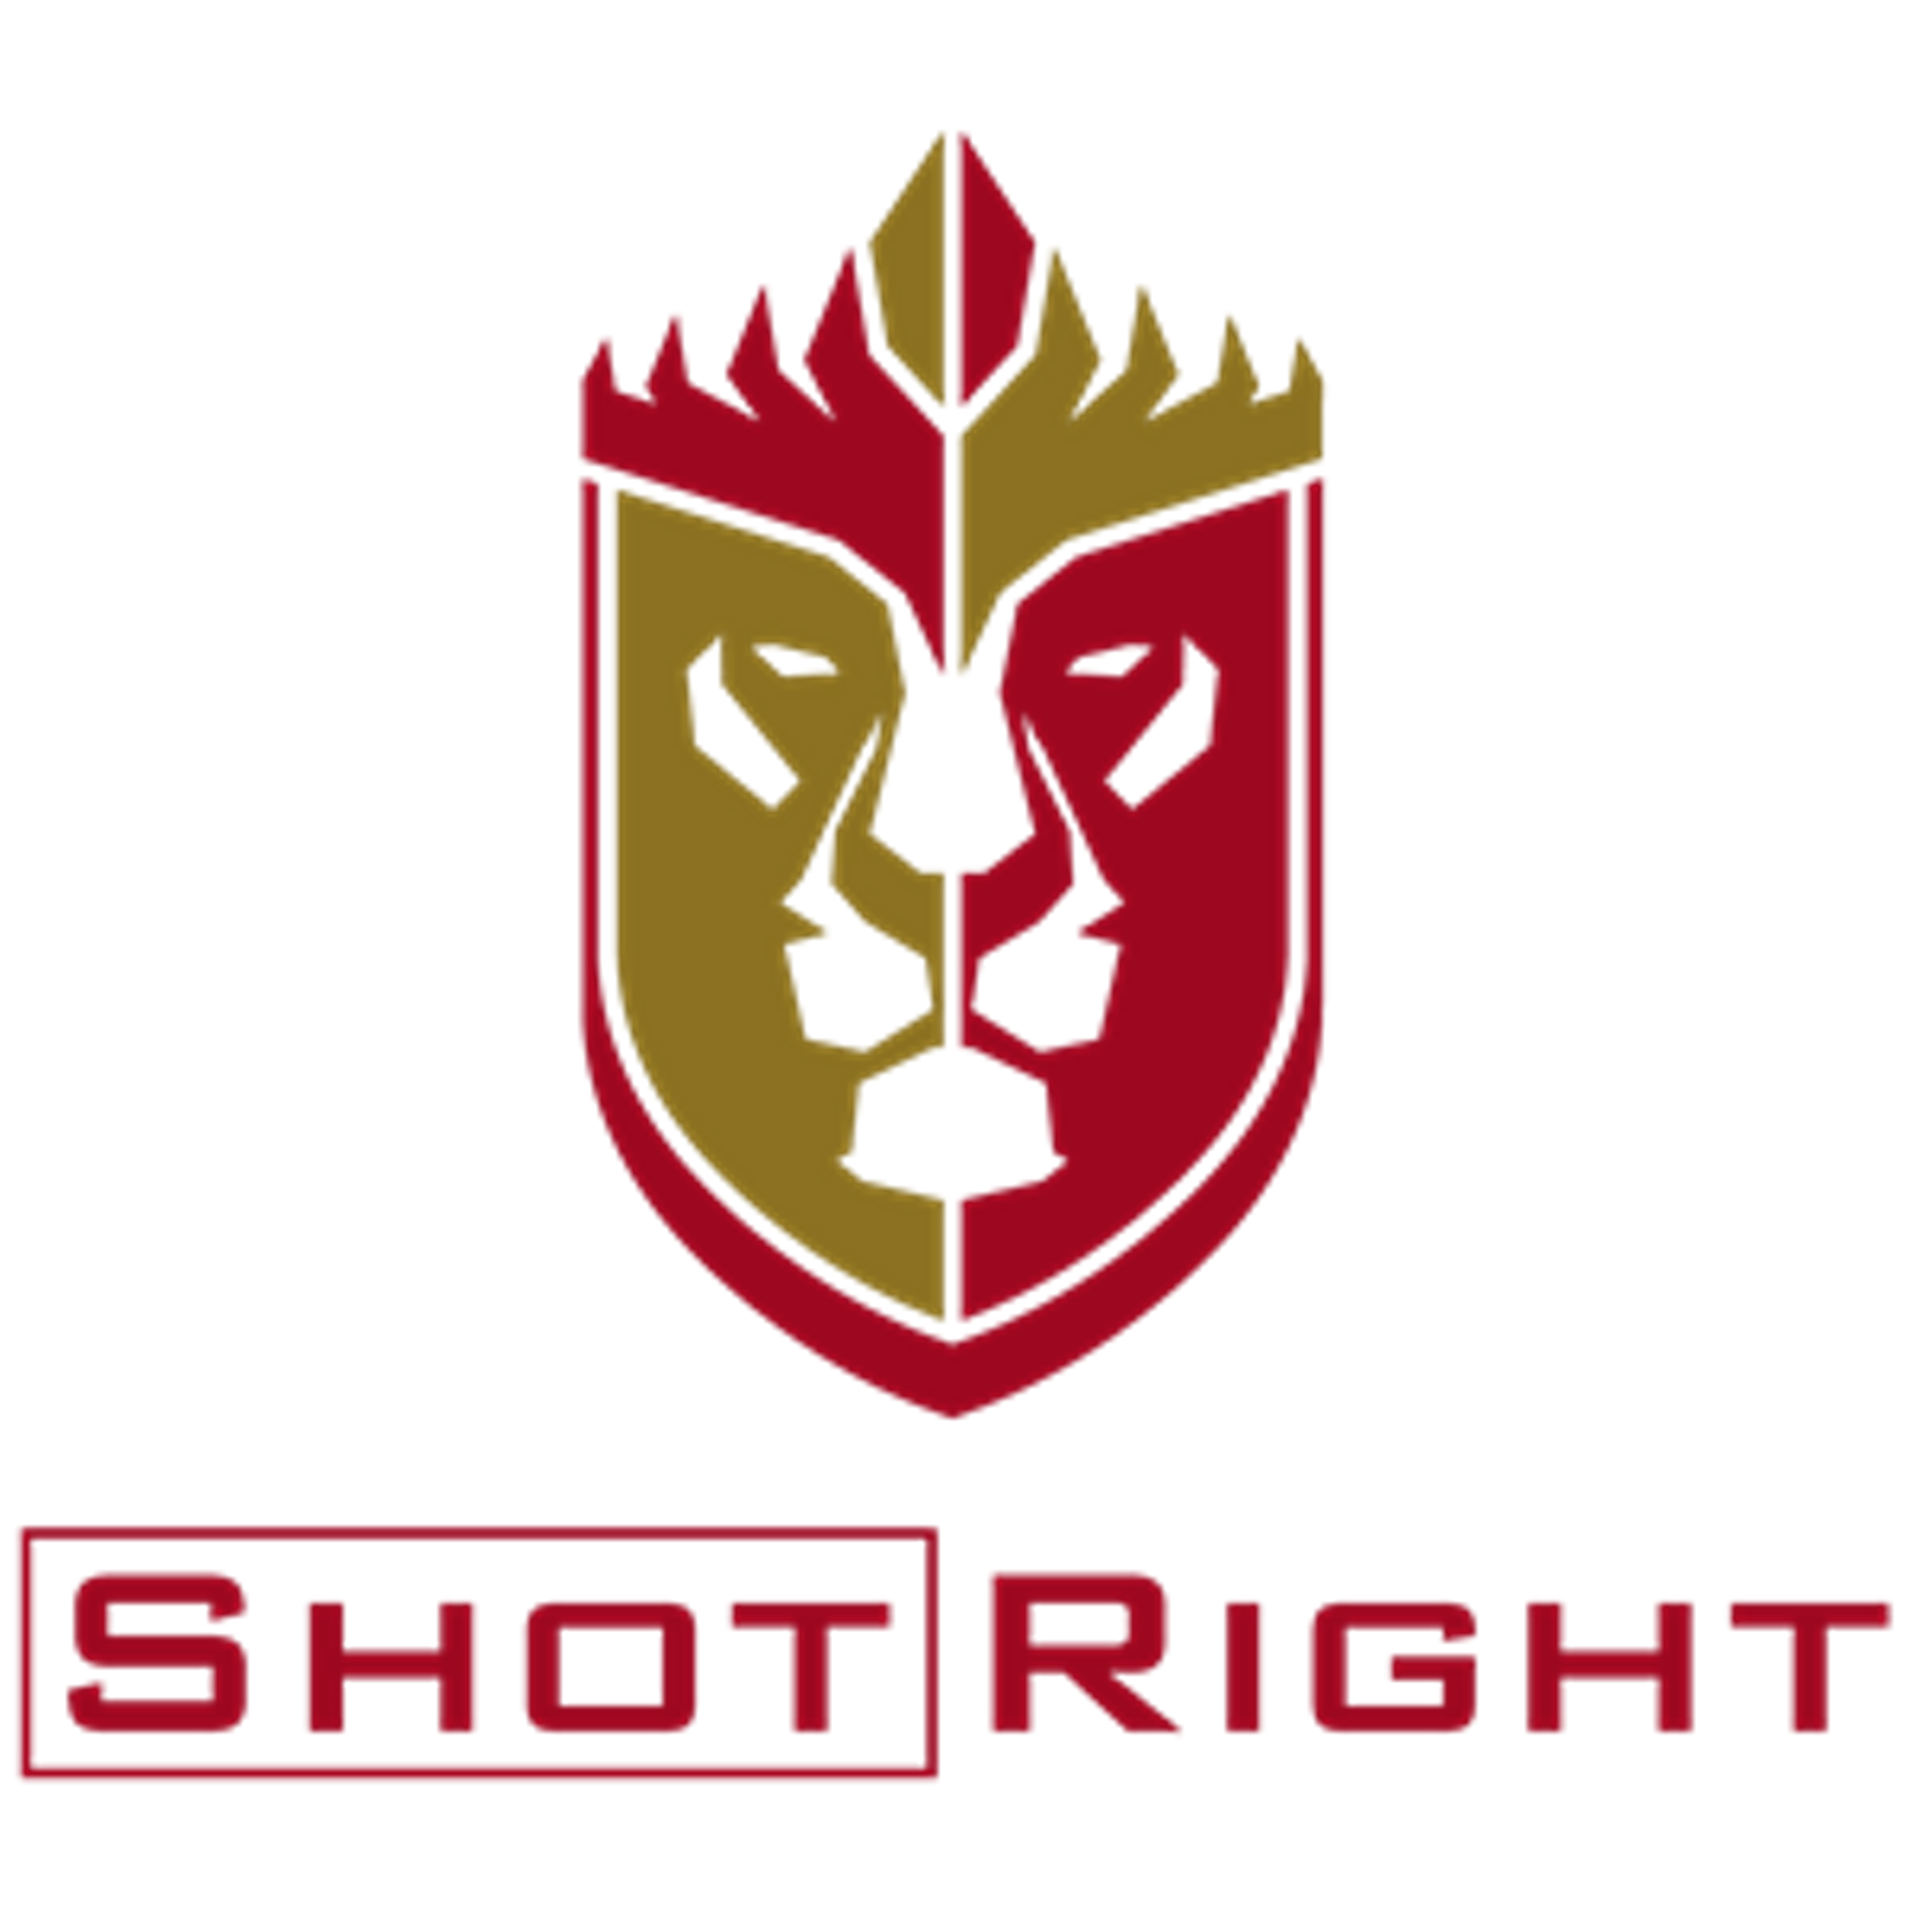 shot right training academy logo nra classes pinterest rh nz pinterest com nra logo vector nra logo download